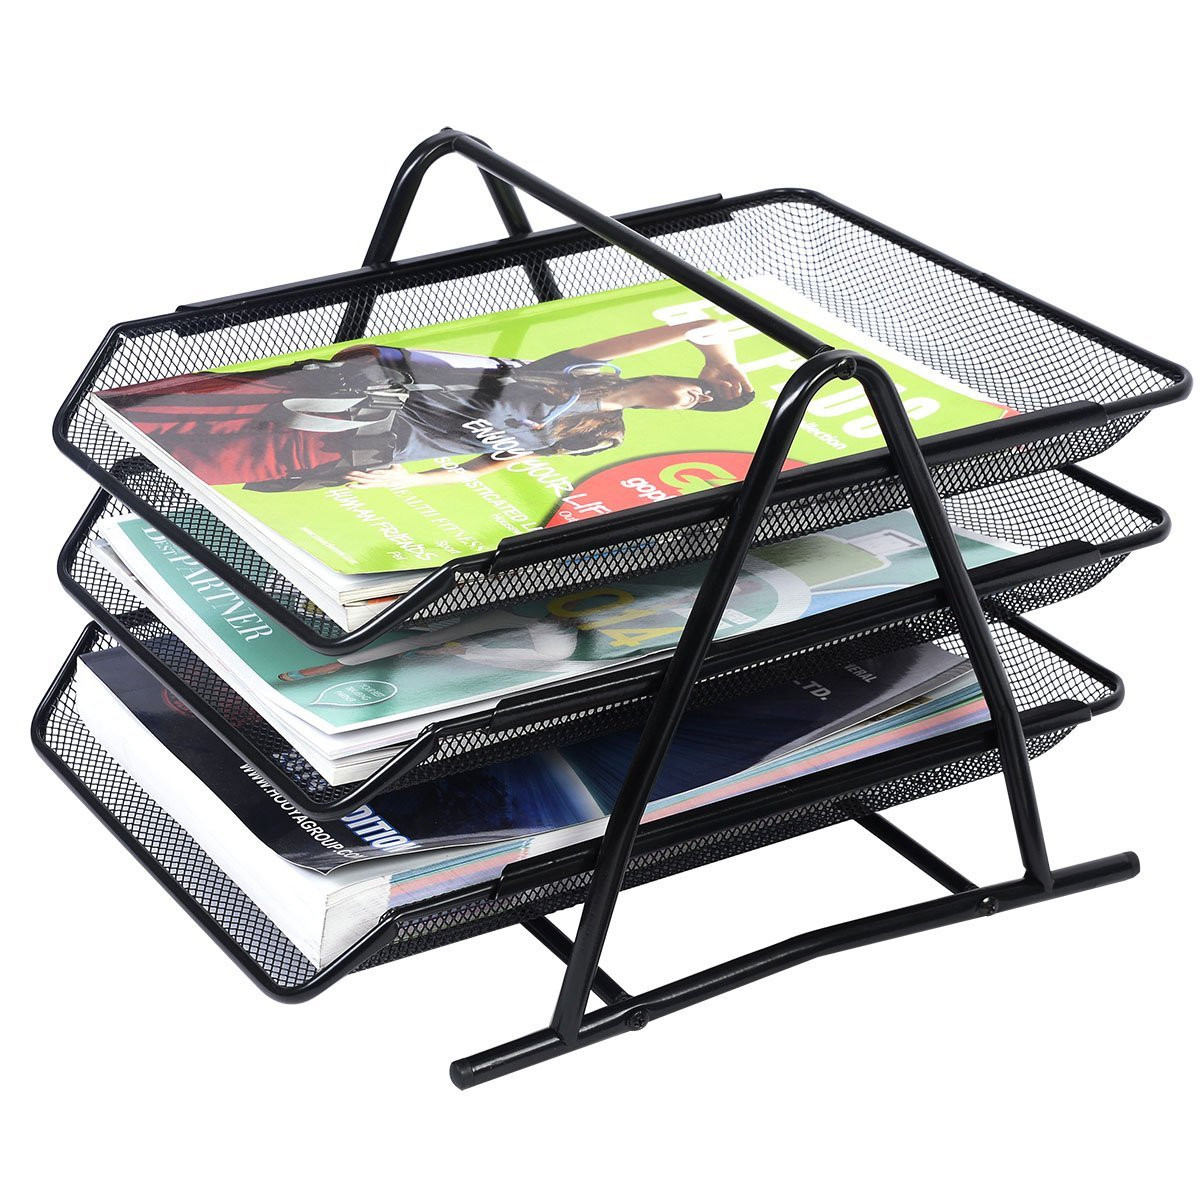 Desk Organizer Tray  Desks Aesthetic Appearance Desk Organizer Tray — Aasp us